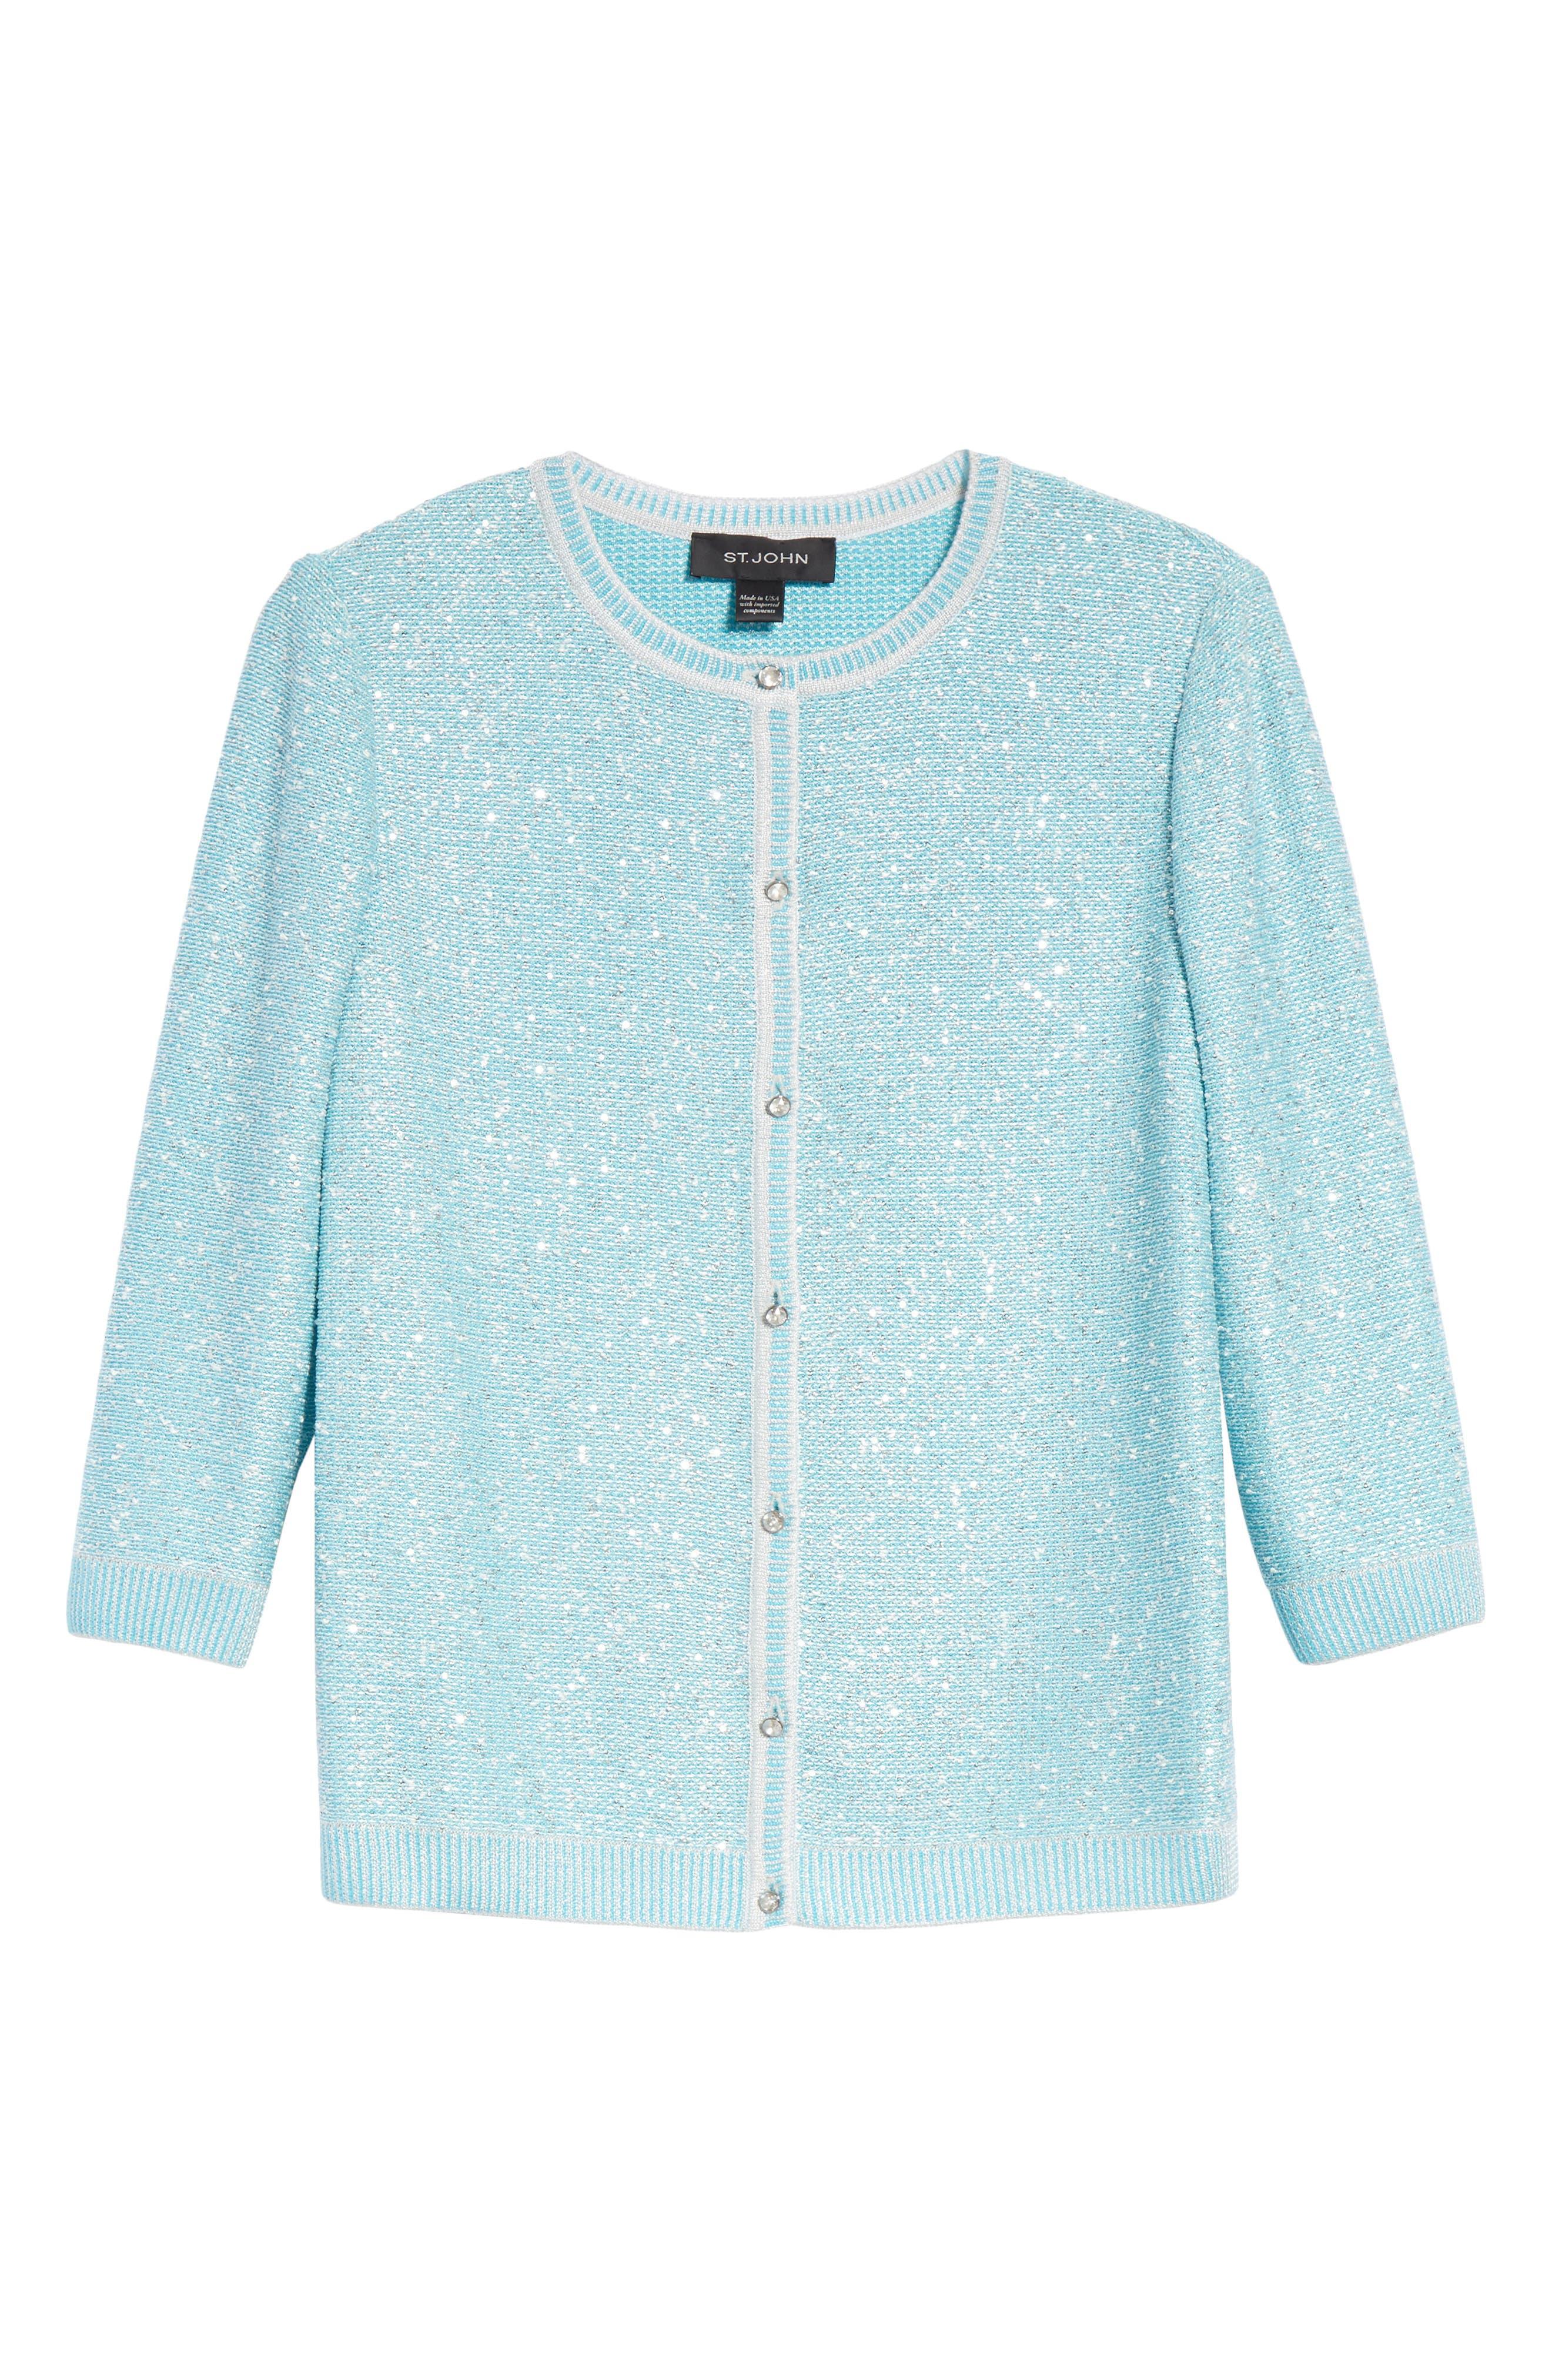 Flecked Sparkle Knit Cardigan,                             Alternate thumbnail 6, color,                             Aqua Multi